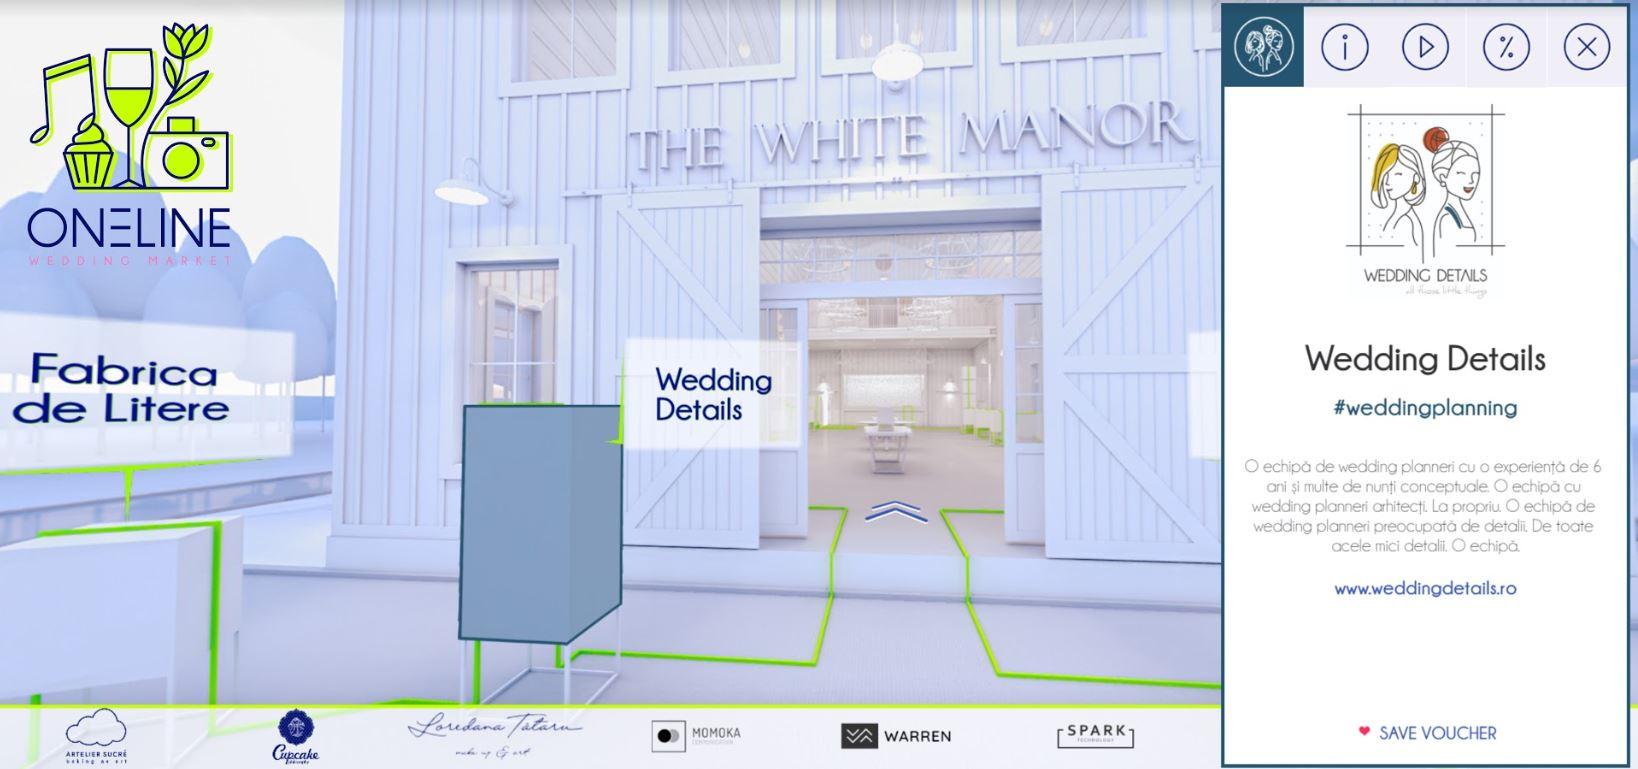 wedding details-atelierele-ilbah-1